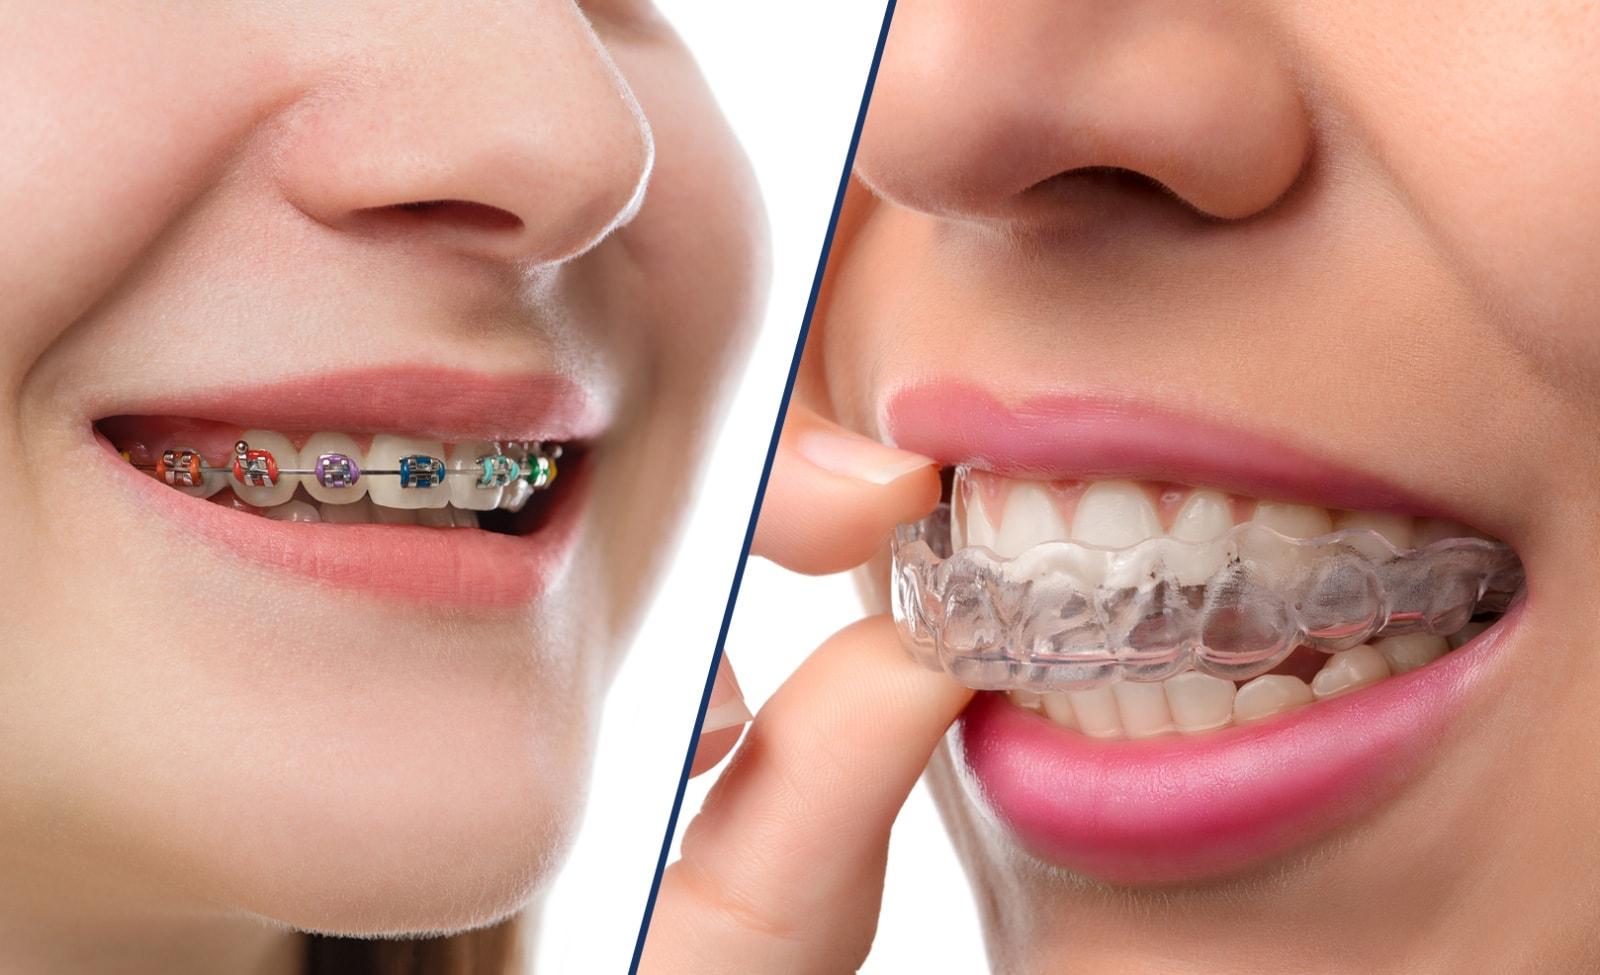 ¿Qué tipo de ortodoncia elegir? ¿Brackets o aligners transparentes?